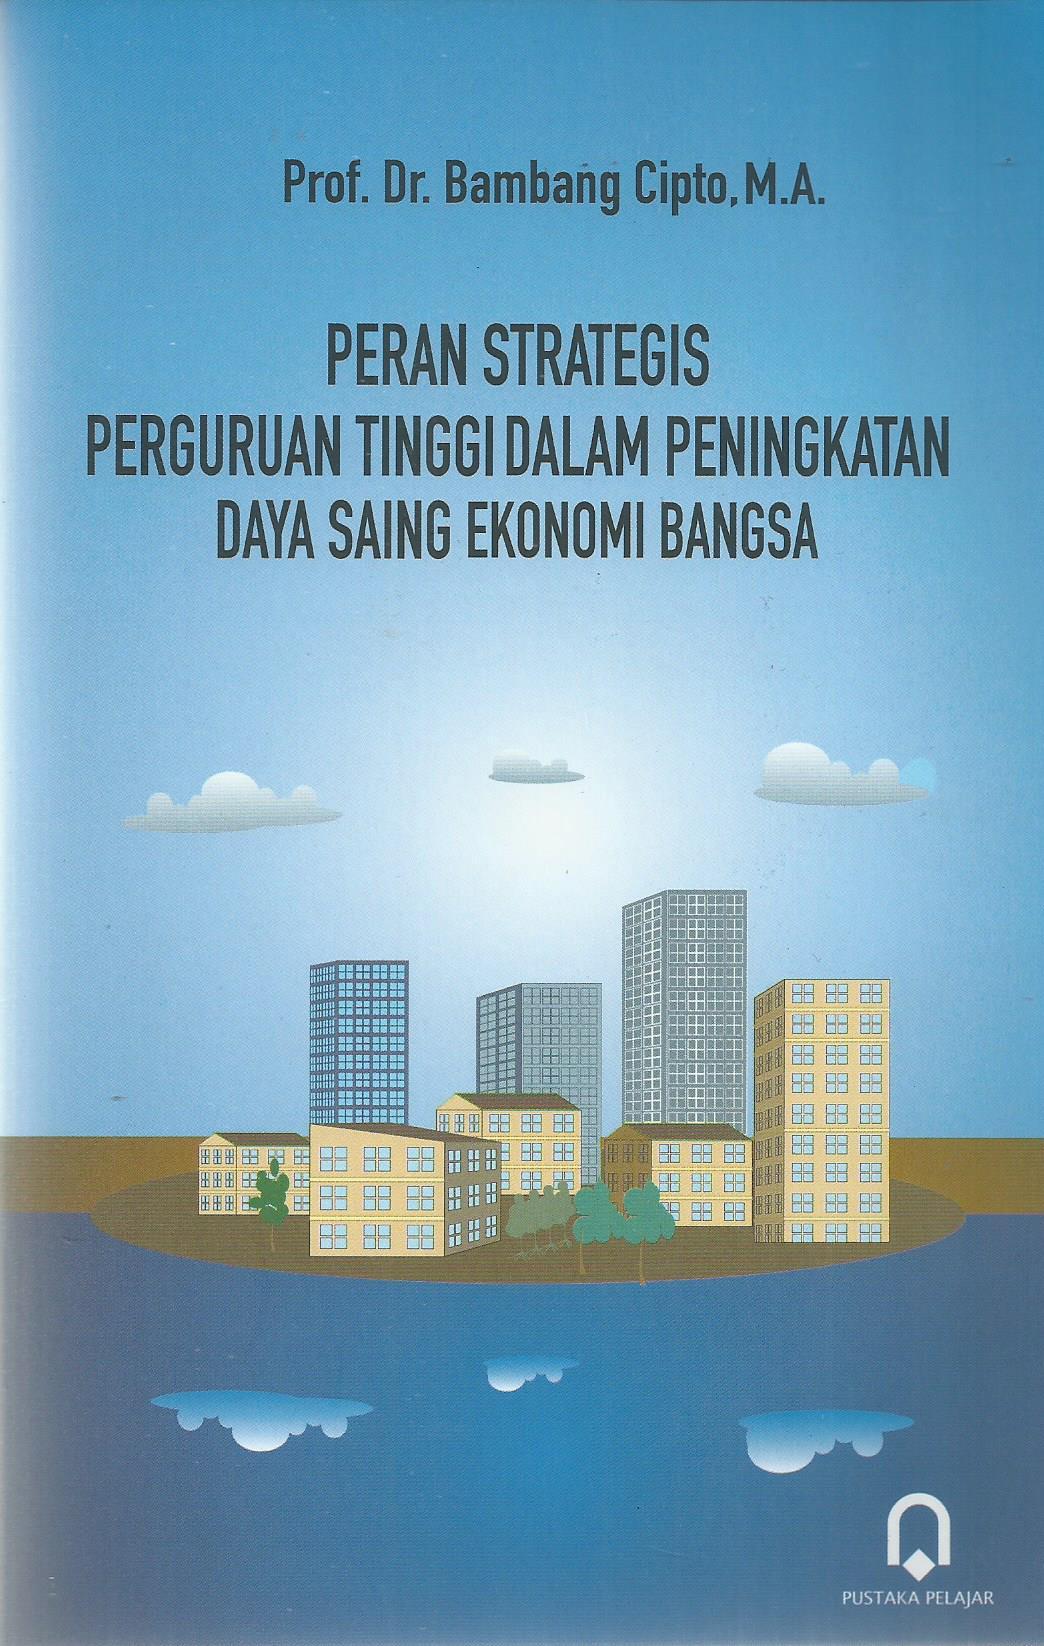 Peran Strategis Perguruan Tinggi Dalam Peningkatan Daya Saing Ekonomi Bangsa